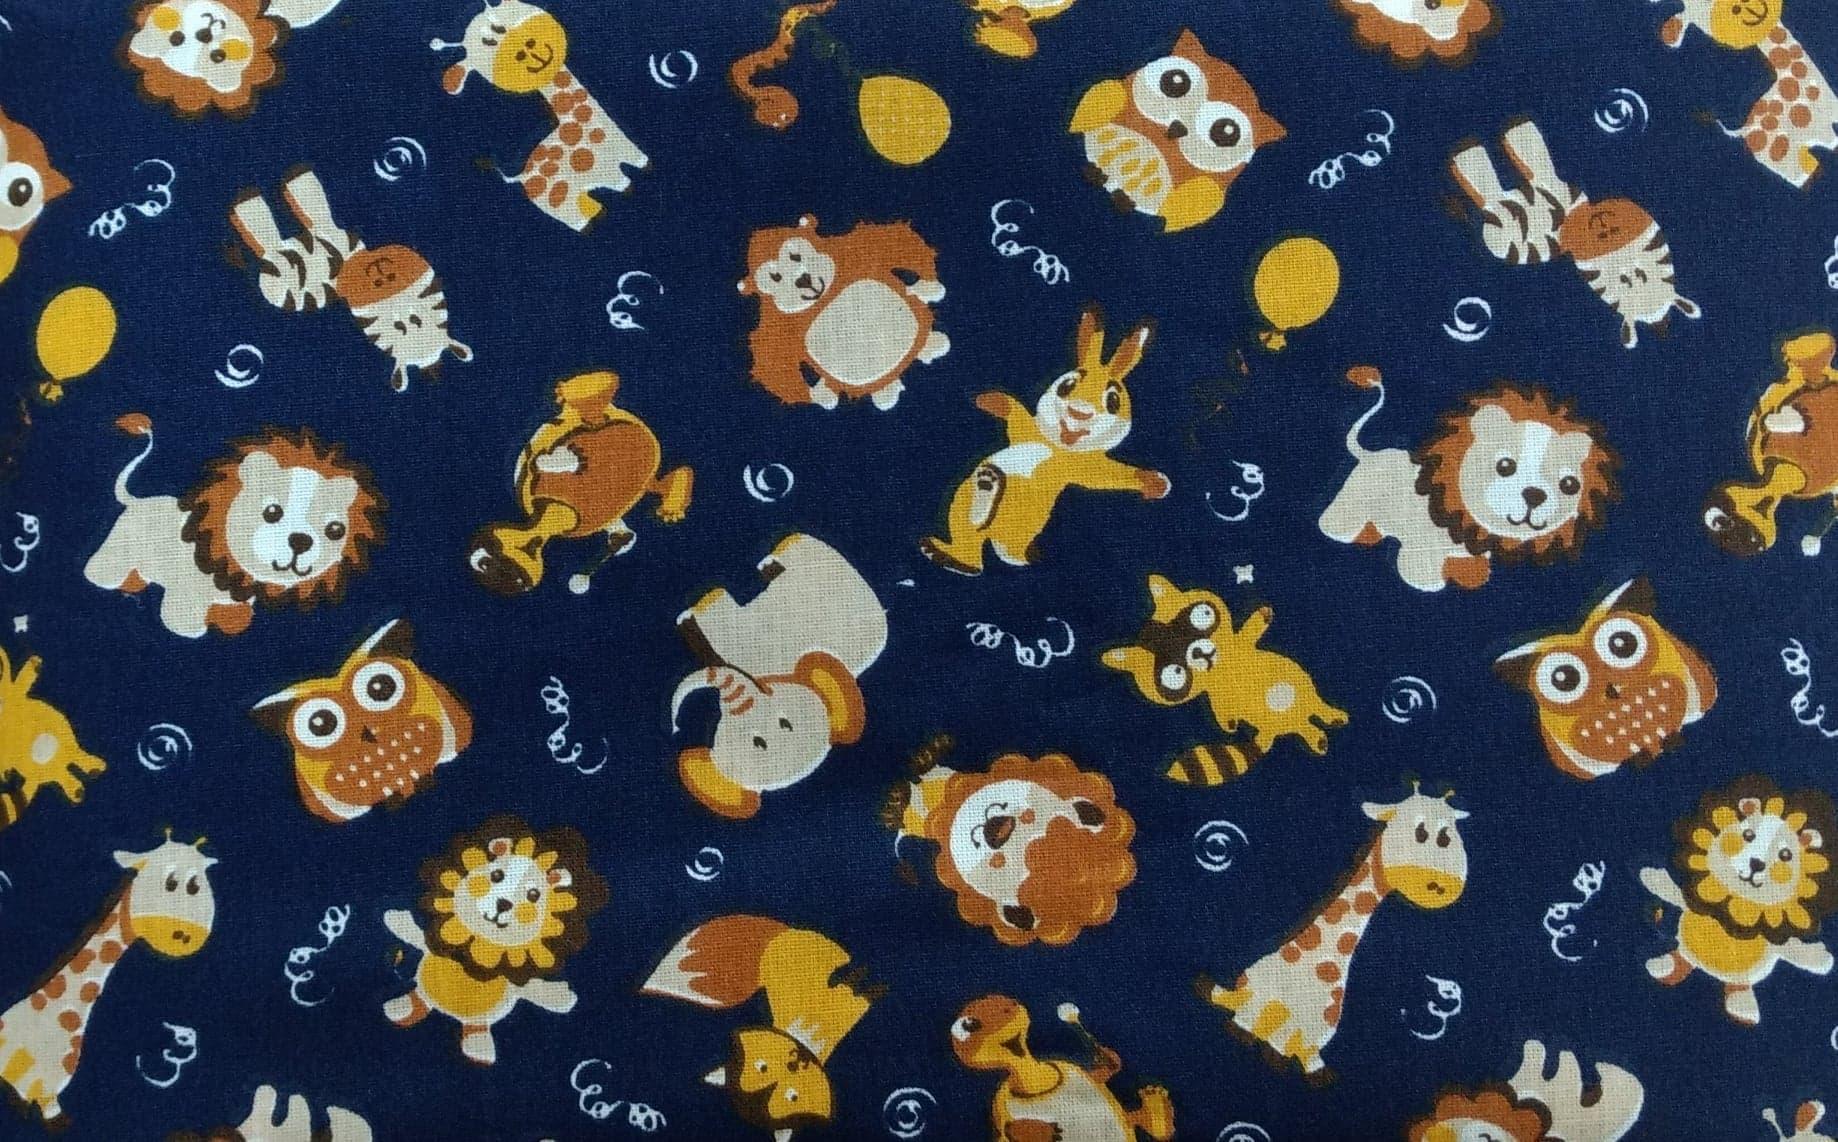 Tecido Tricoline Bichinhos: Macaco, Leão, Coruja, Raposa, Zebra, Girafa, Coelho, Guaxinim e Tartaruga - Fundo Azul Marinho